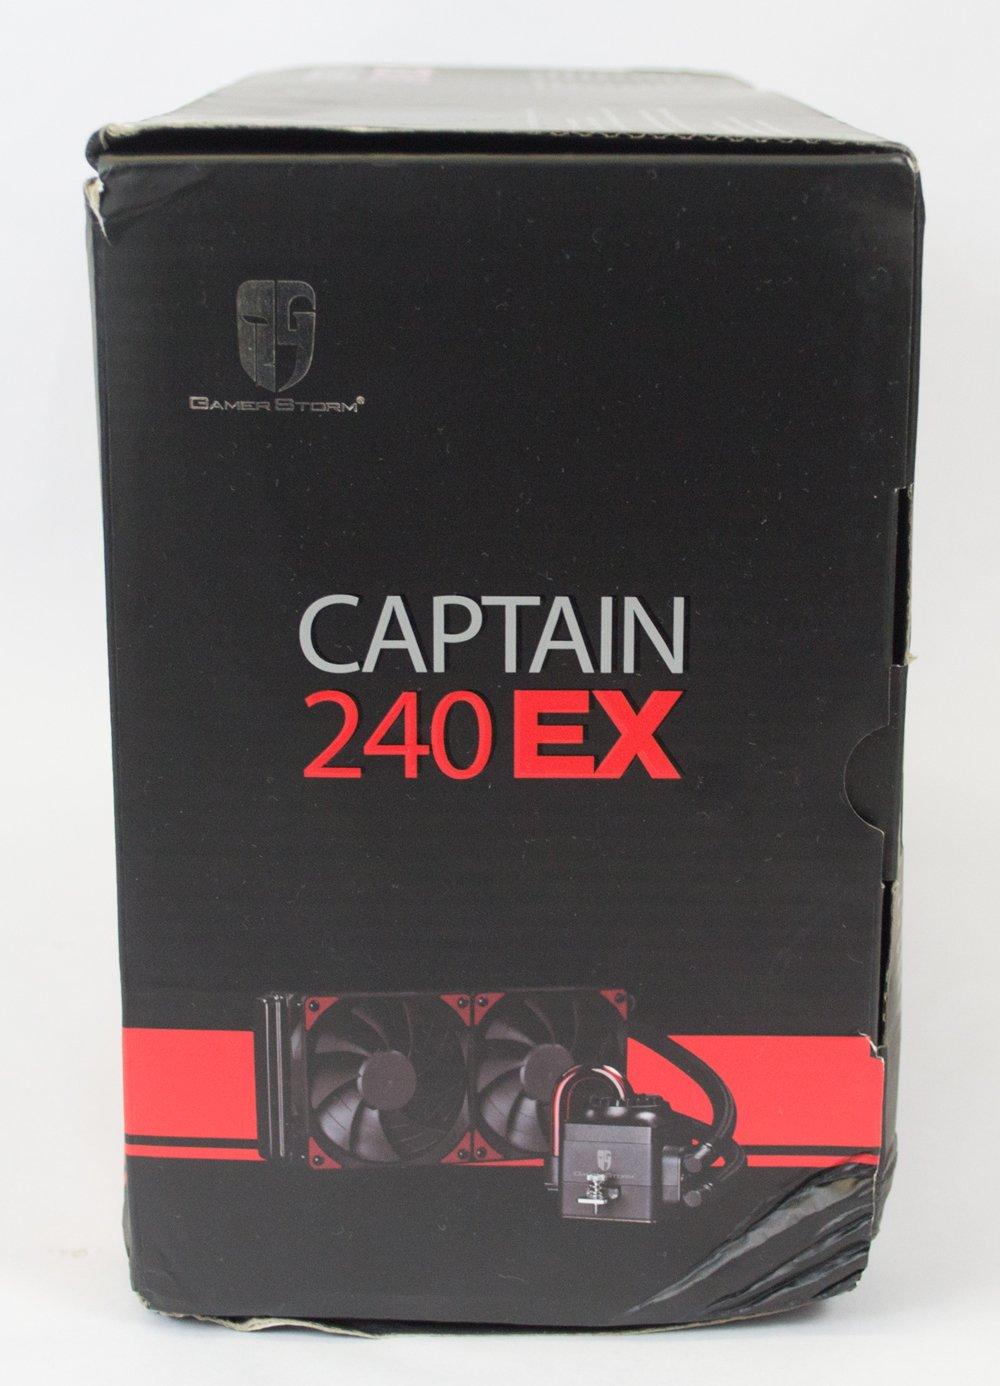 deepcool-gamerstorm-captain-240-ex-box-side-1